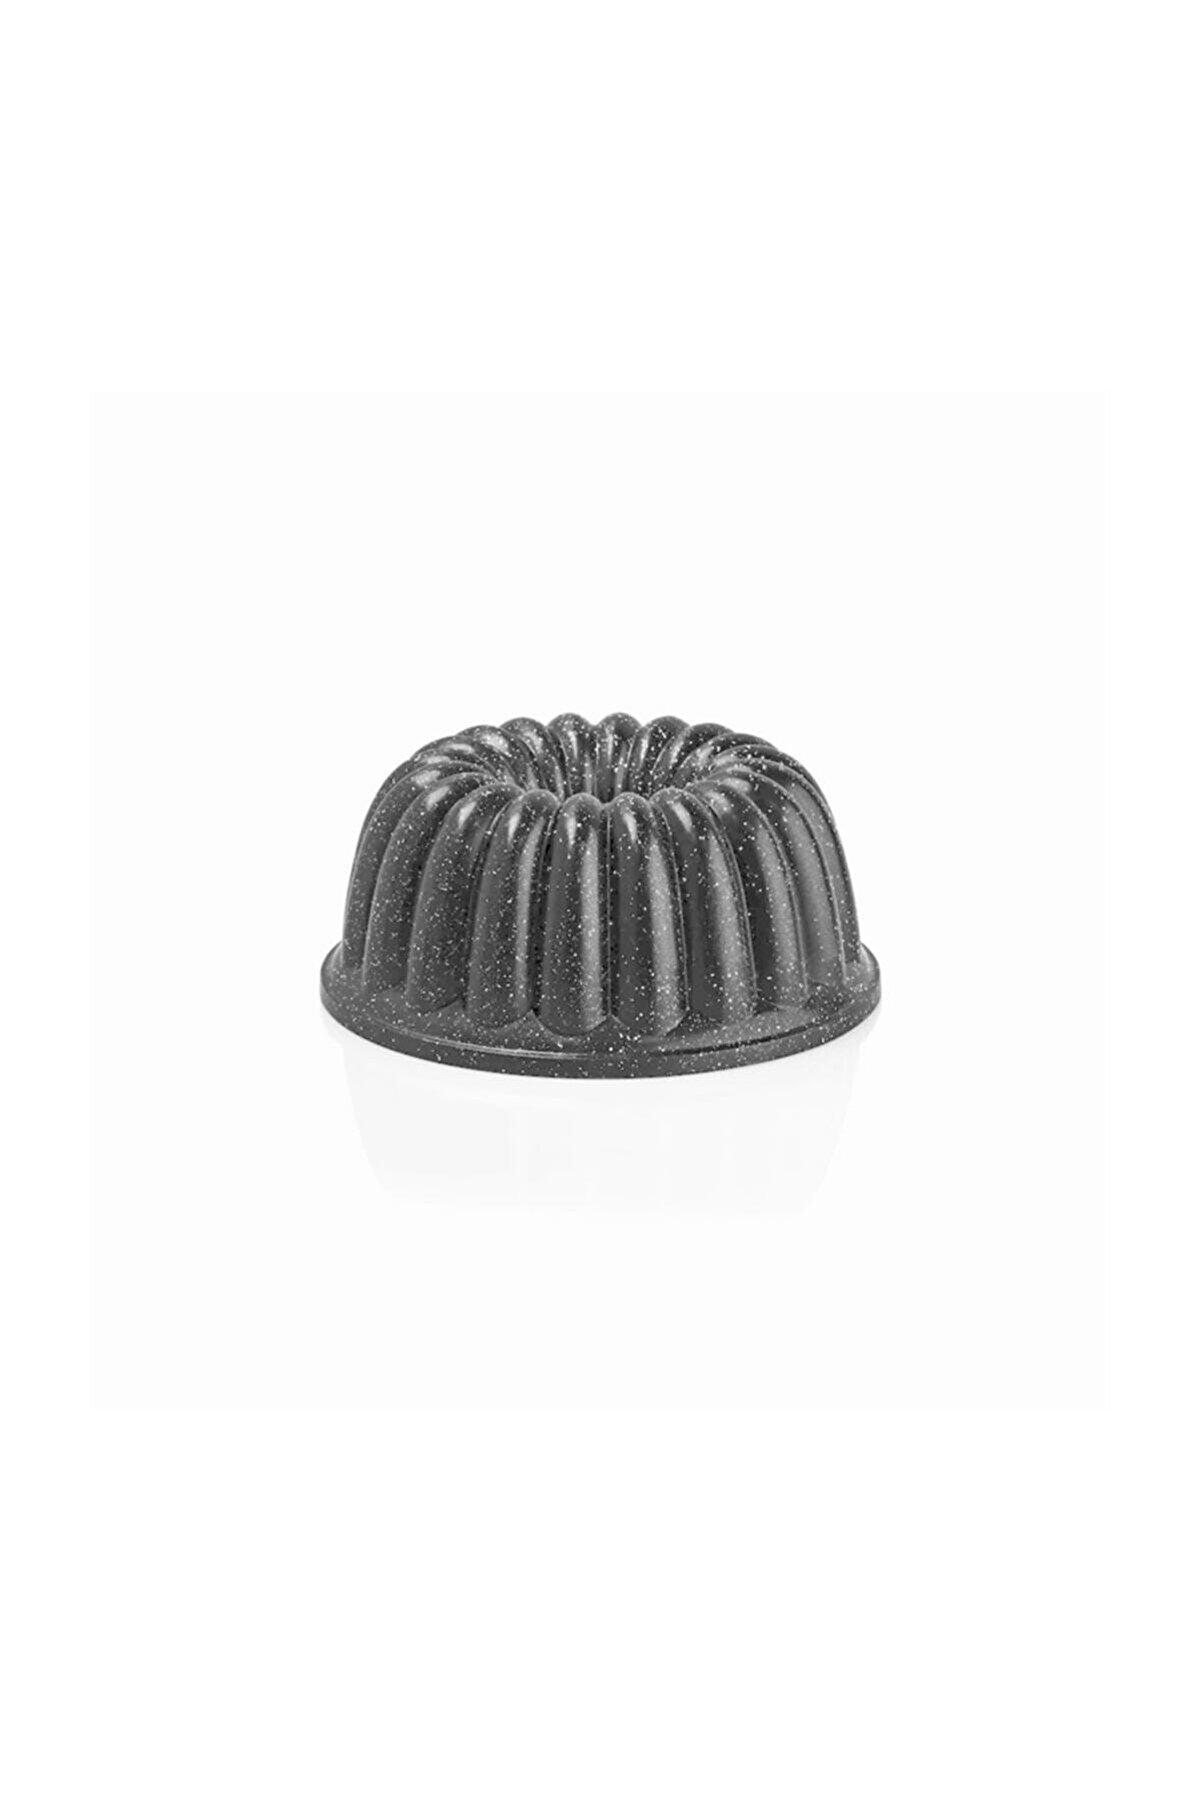 ThermoAD Kek Kalıbı Alüminyum Döküm Granit Sık Dilimli Gri 26 Cm